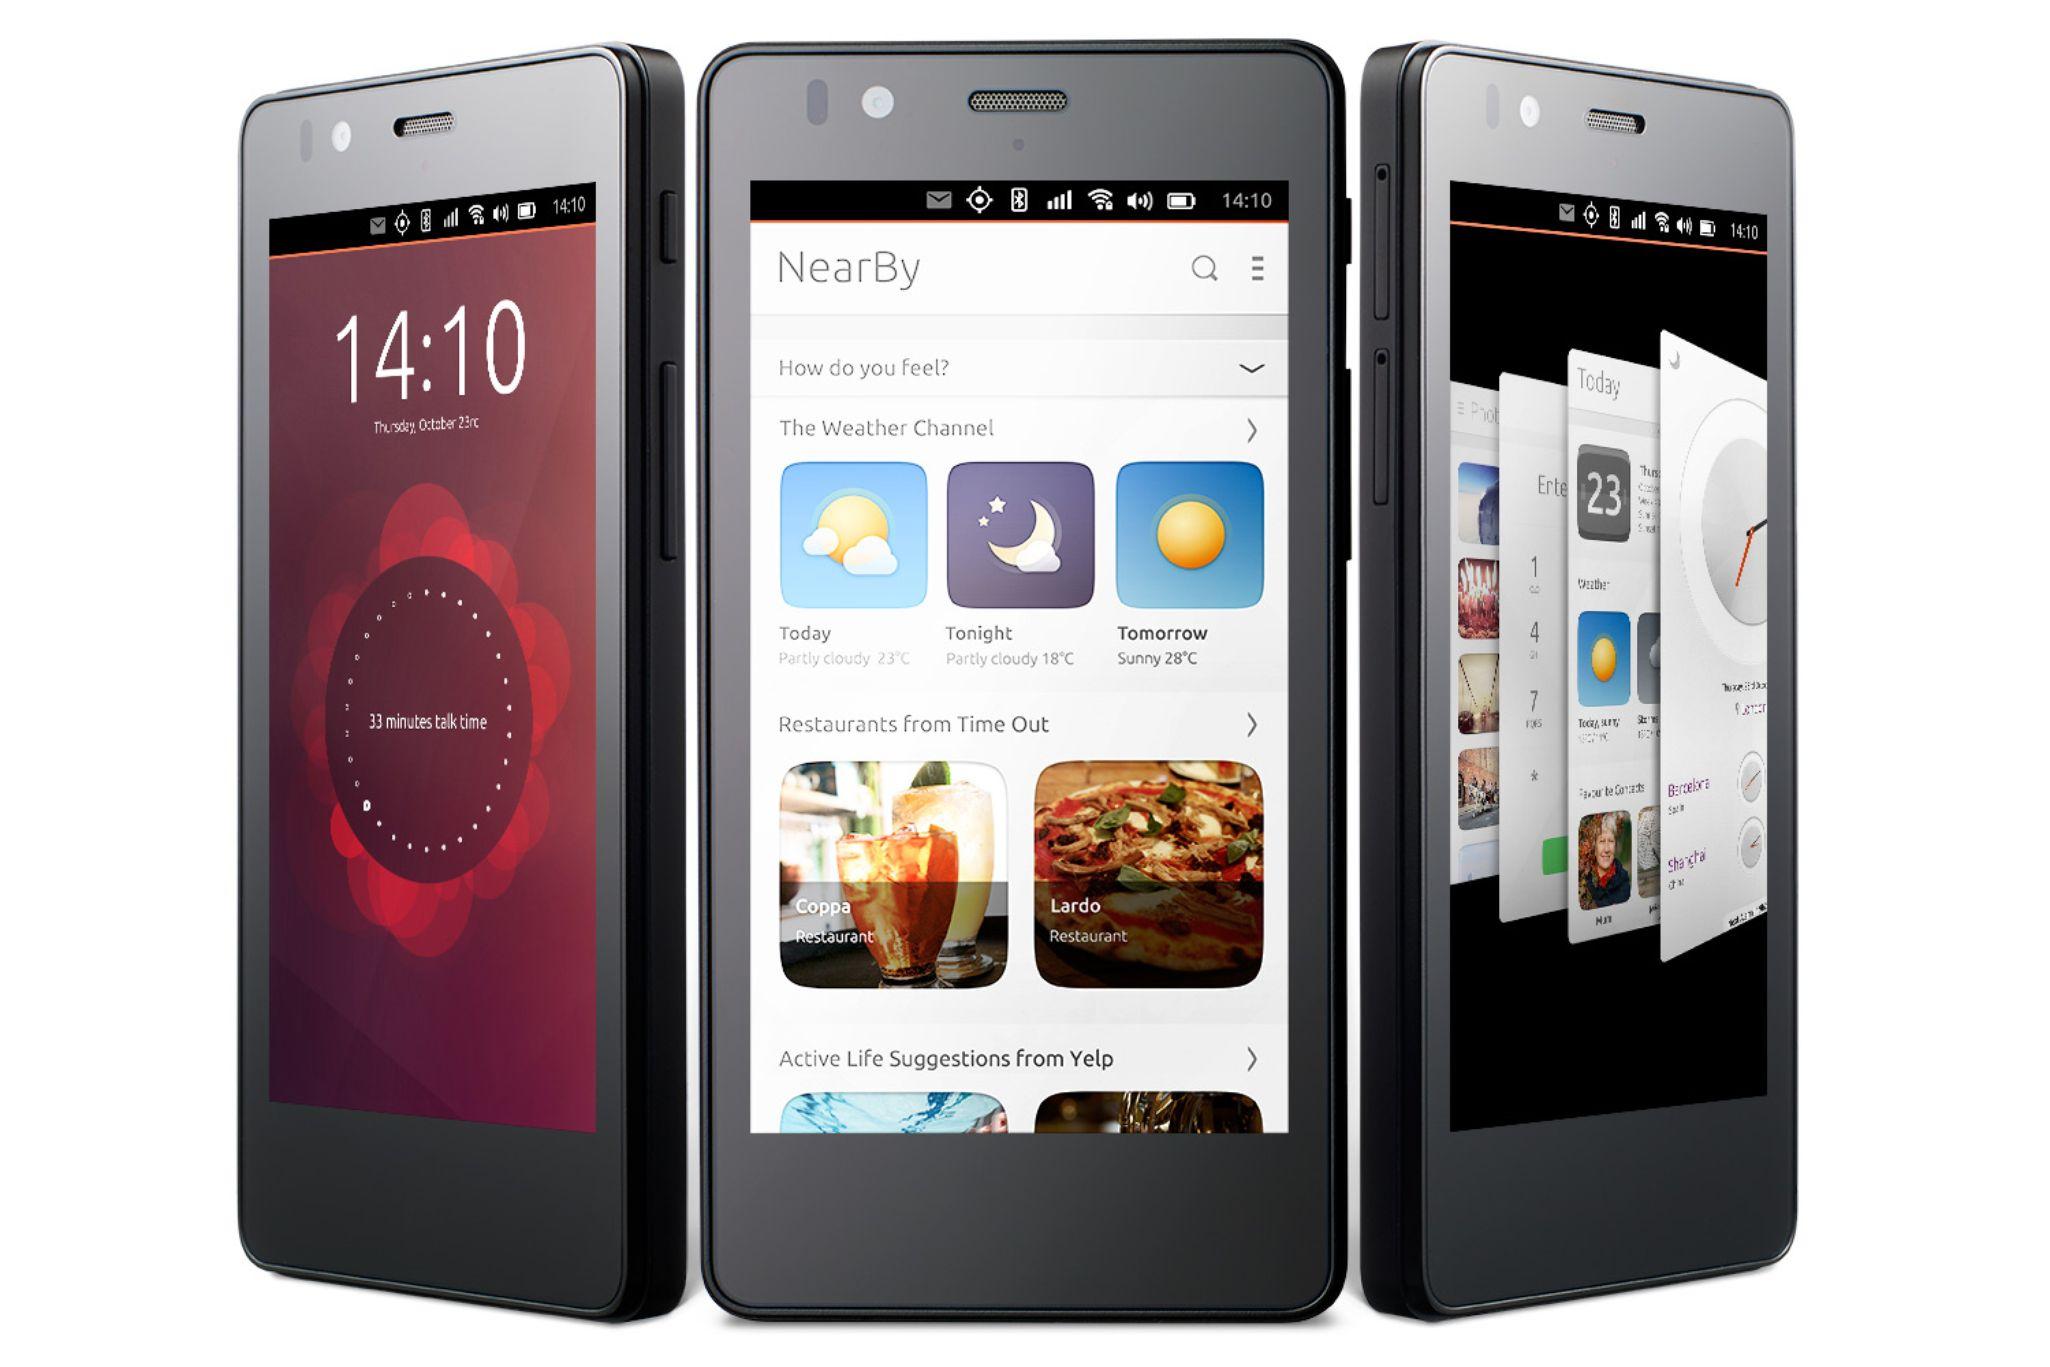 ubuntu-phone-060215-1